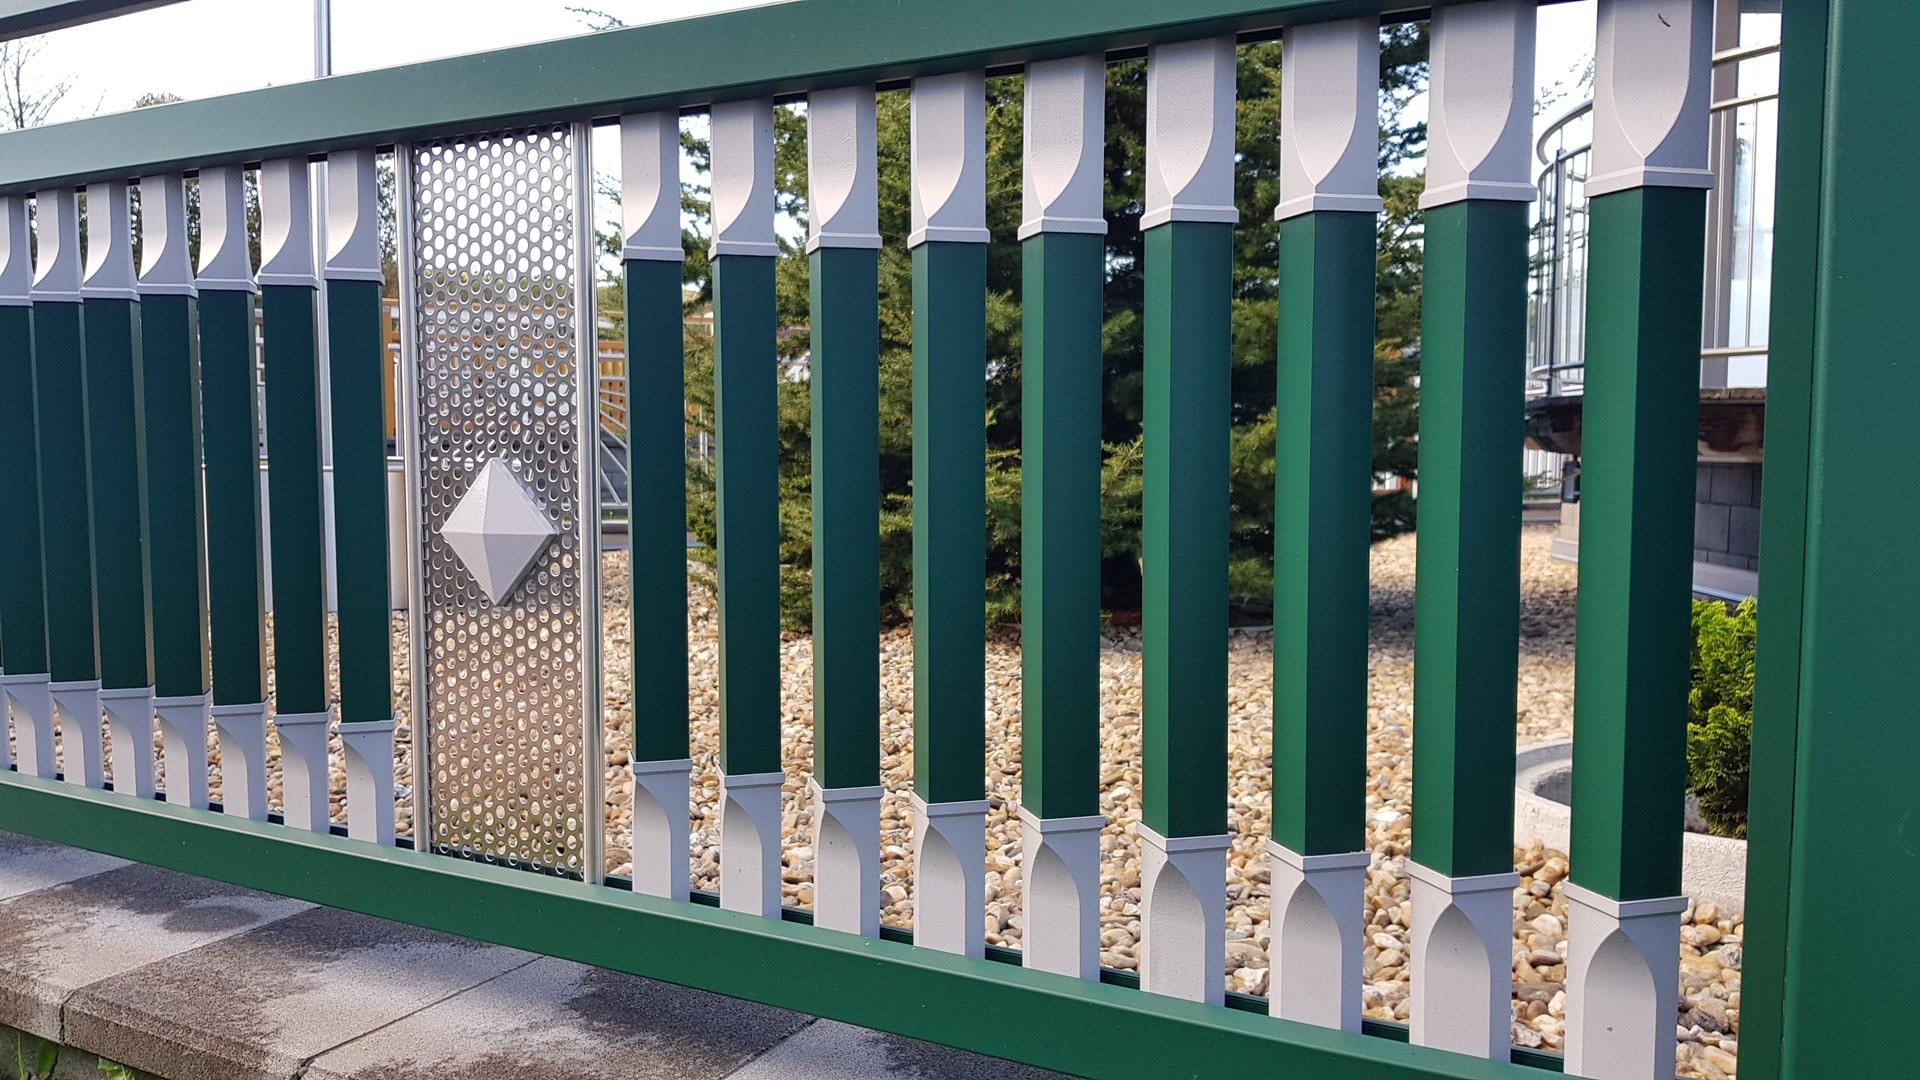 Linz 10 a | Aluminiumgeländer grün-grau mit gedrehten viereckigen Latten & Niro-Lochblech | Svoboda